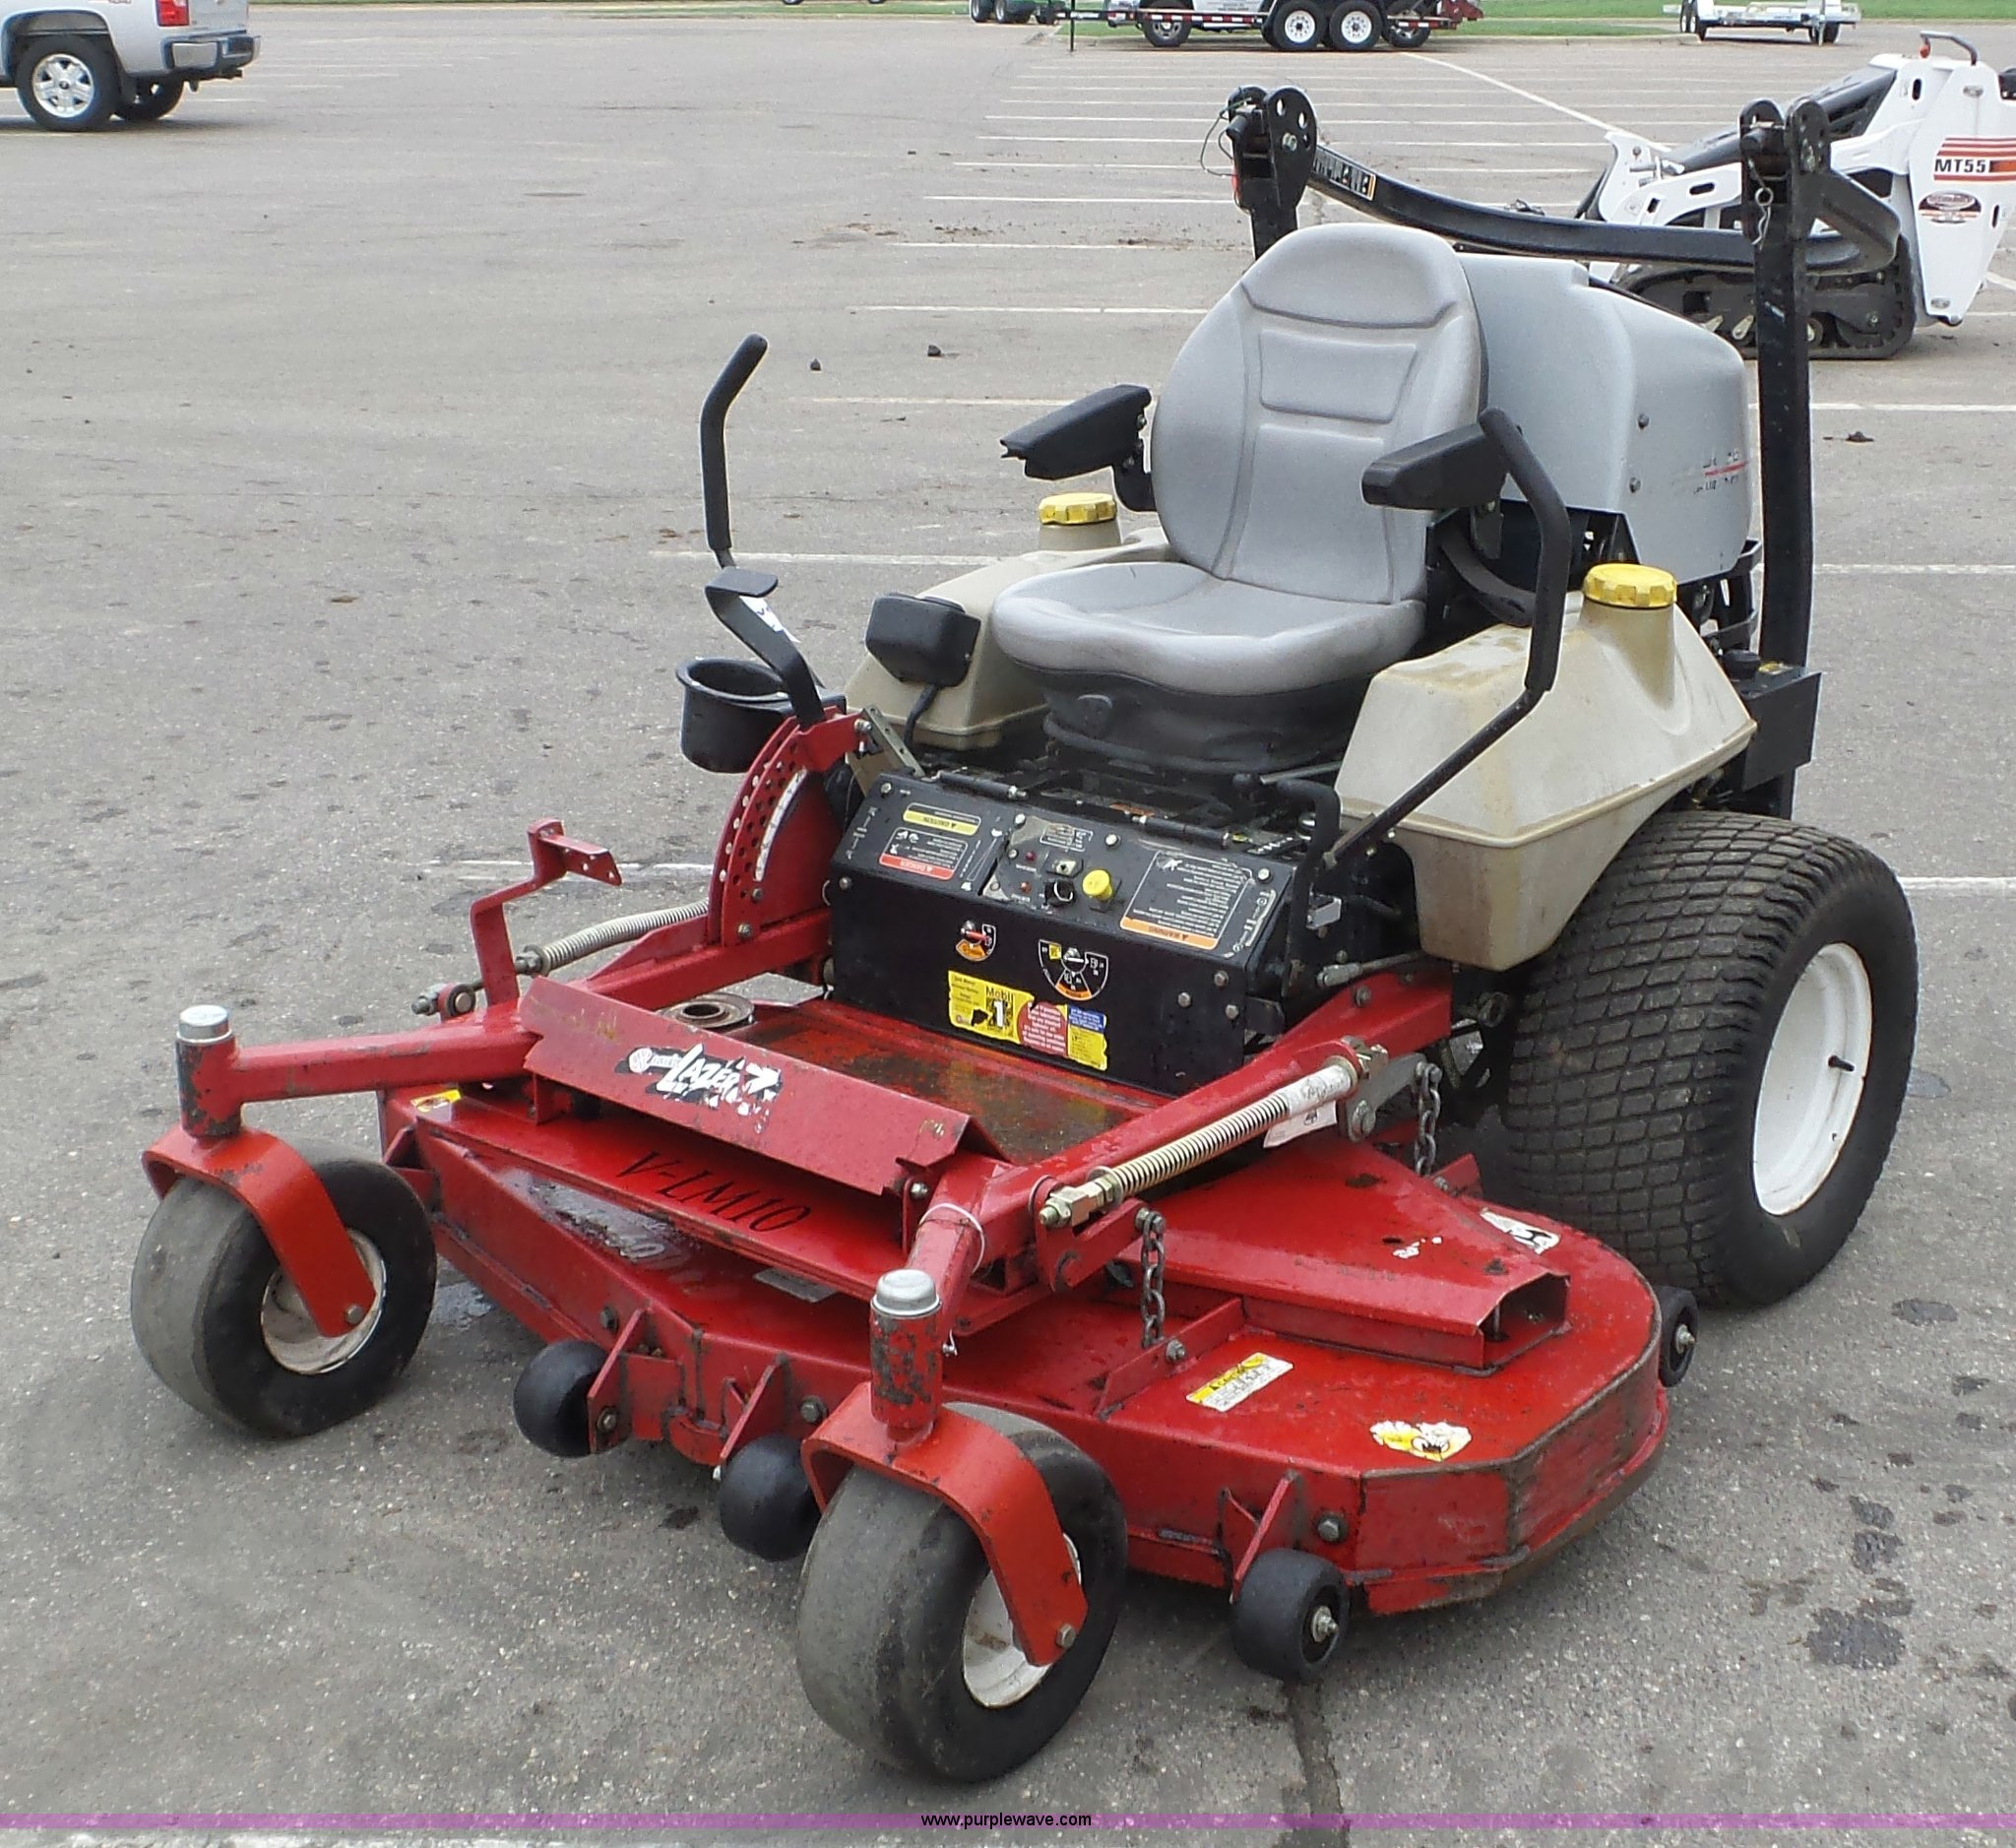 K4652 image for item K4652 Exmark Laser Z ZTR lawn mower